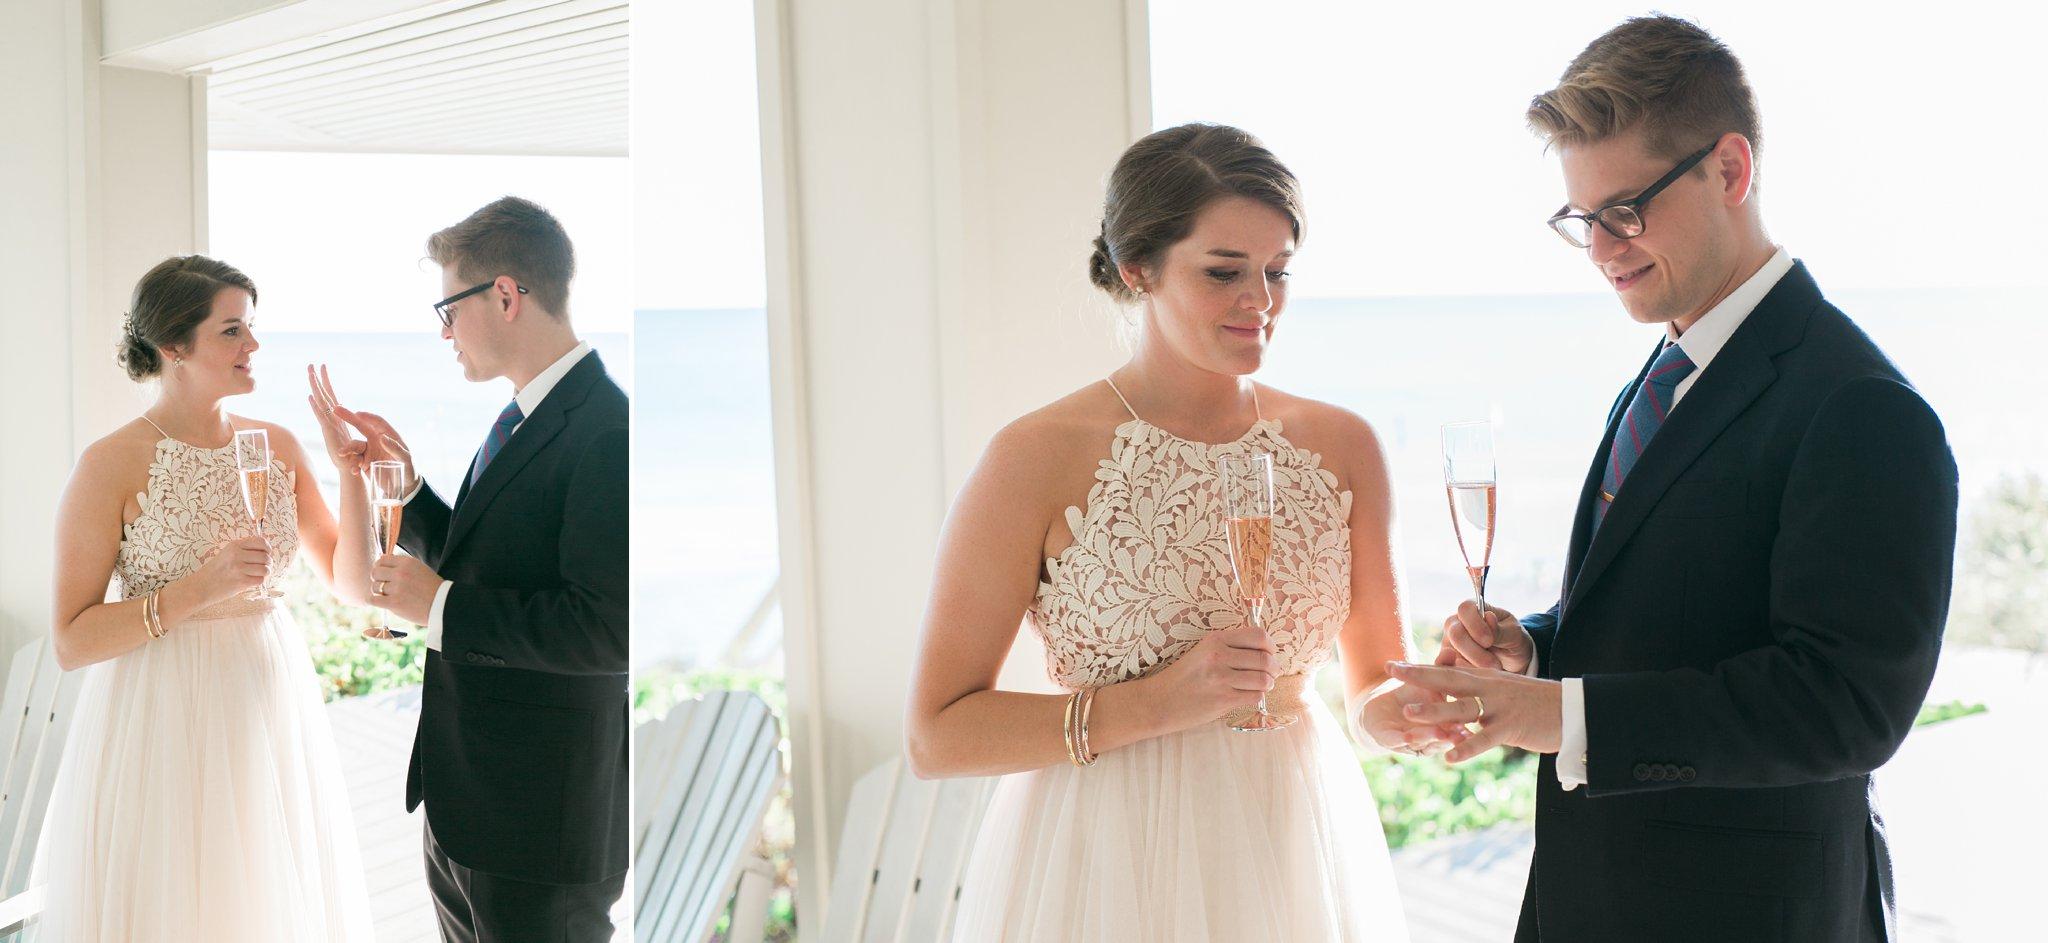 inlet beach wedding 30a wedding inlet beach wedding photographer shannon griffin photography_0003.jpg